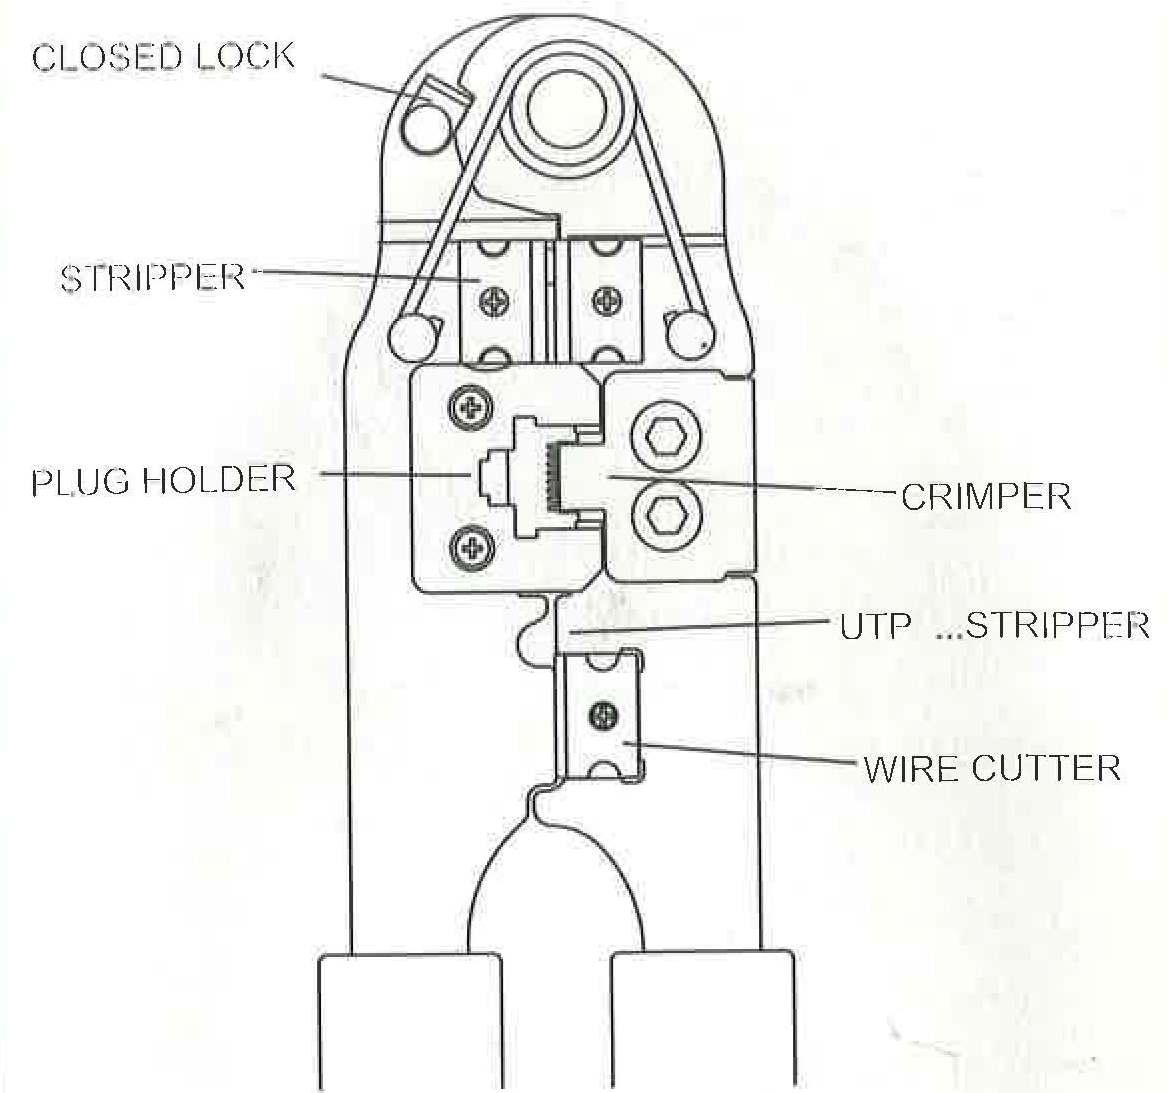 6P6C (RJ12), 6P4C (RJ11) Modular Plug Crimp Tool